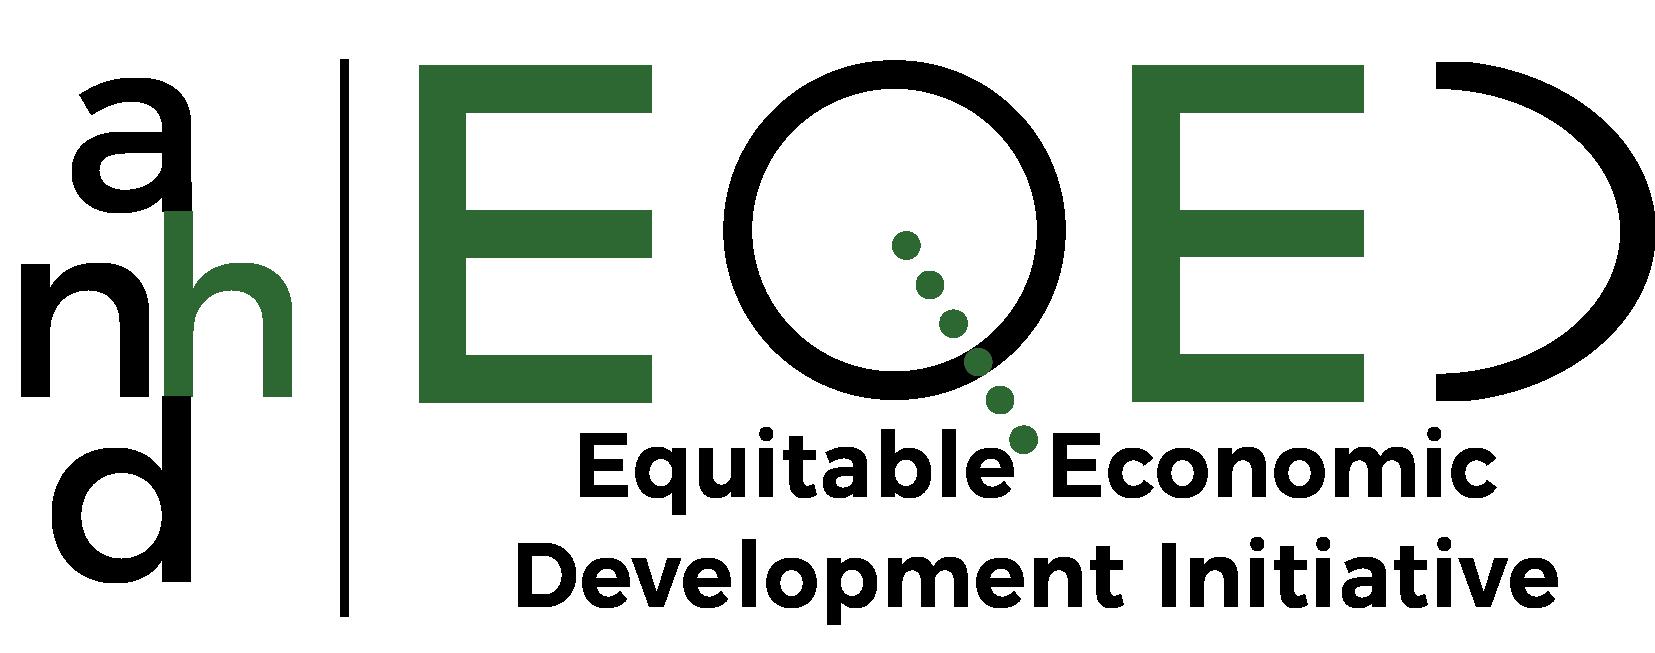 eqed-logo_green